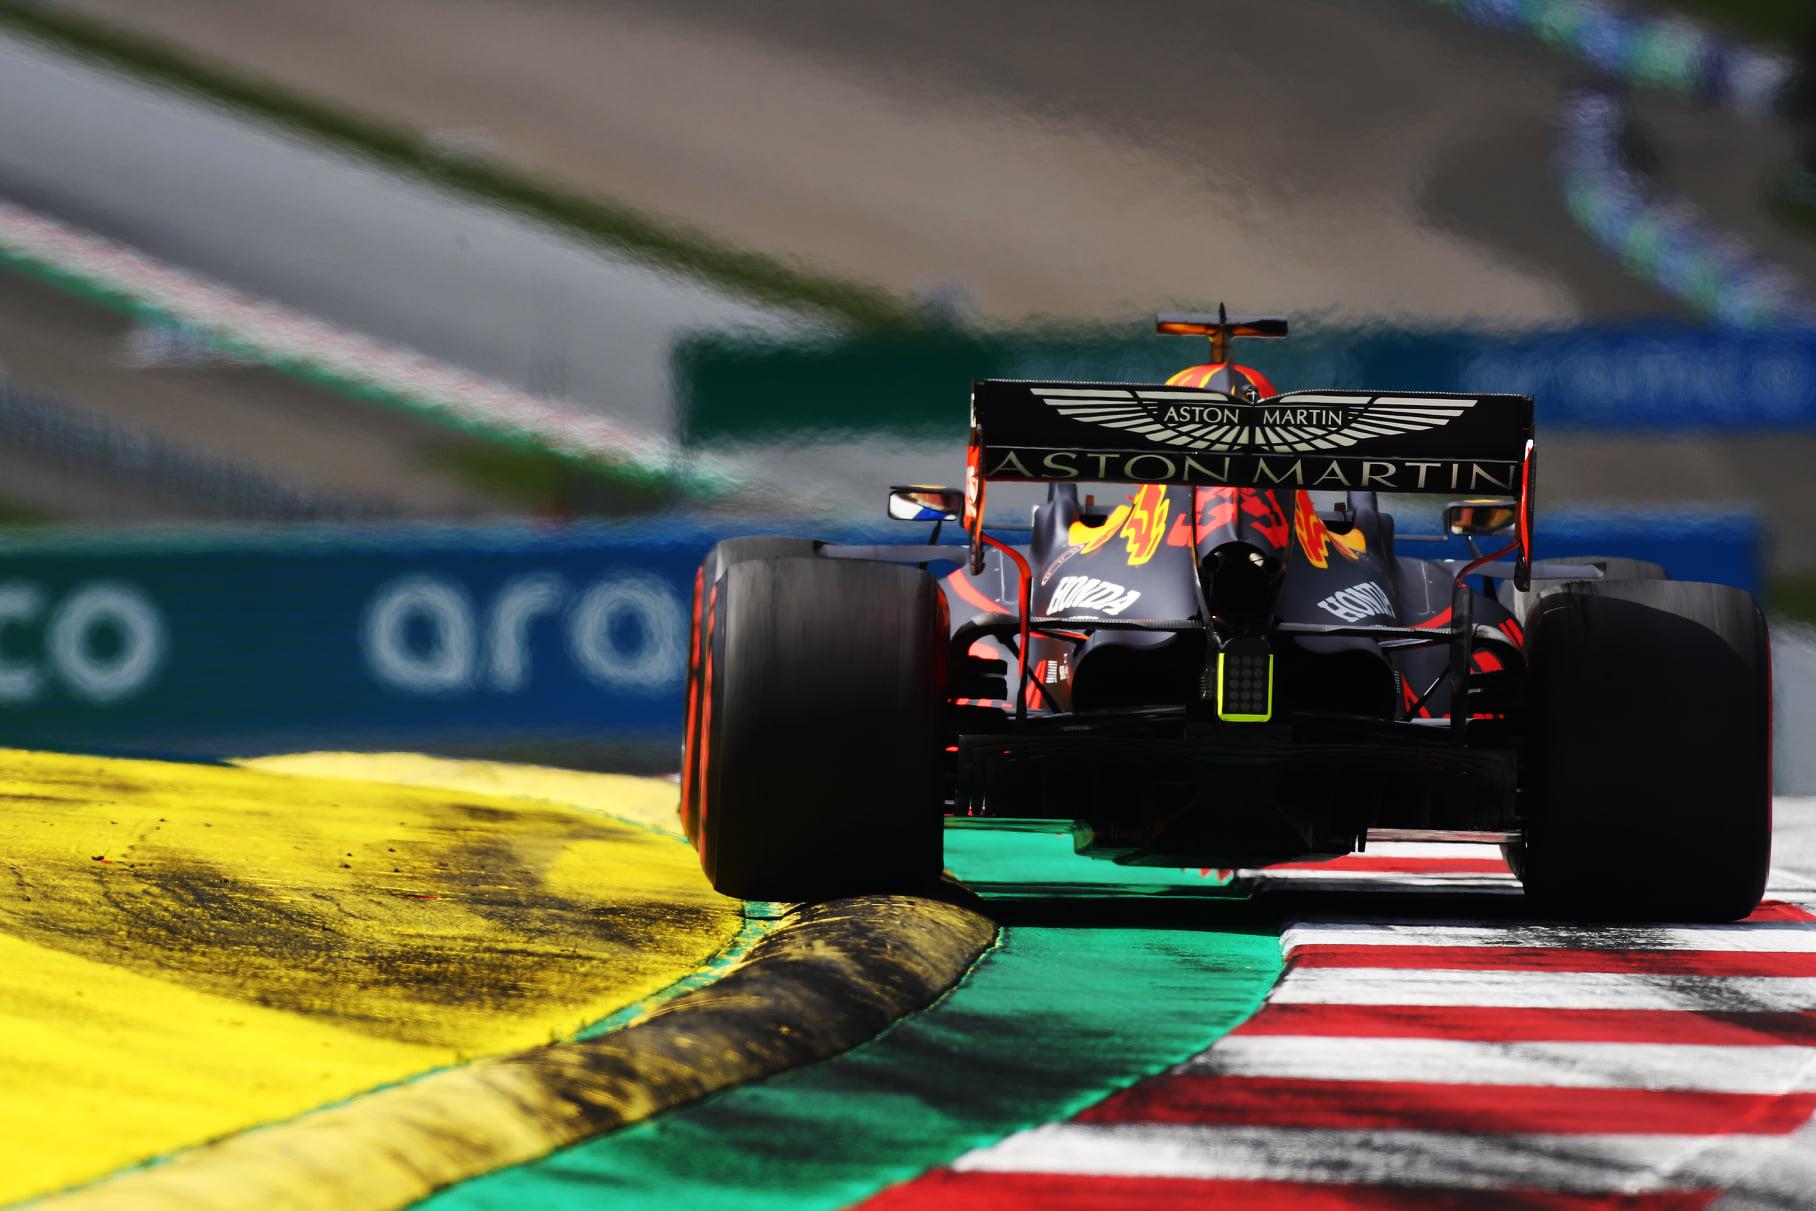 Aston Martin Red Bull Racing F1